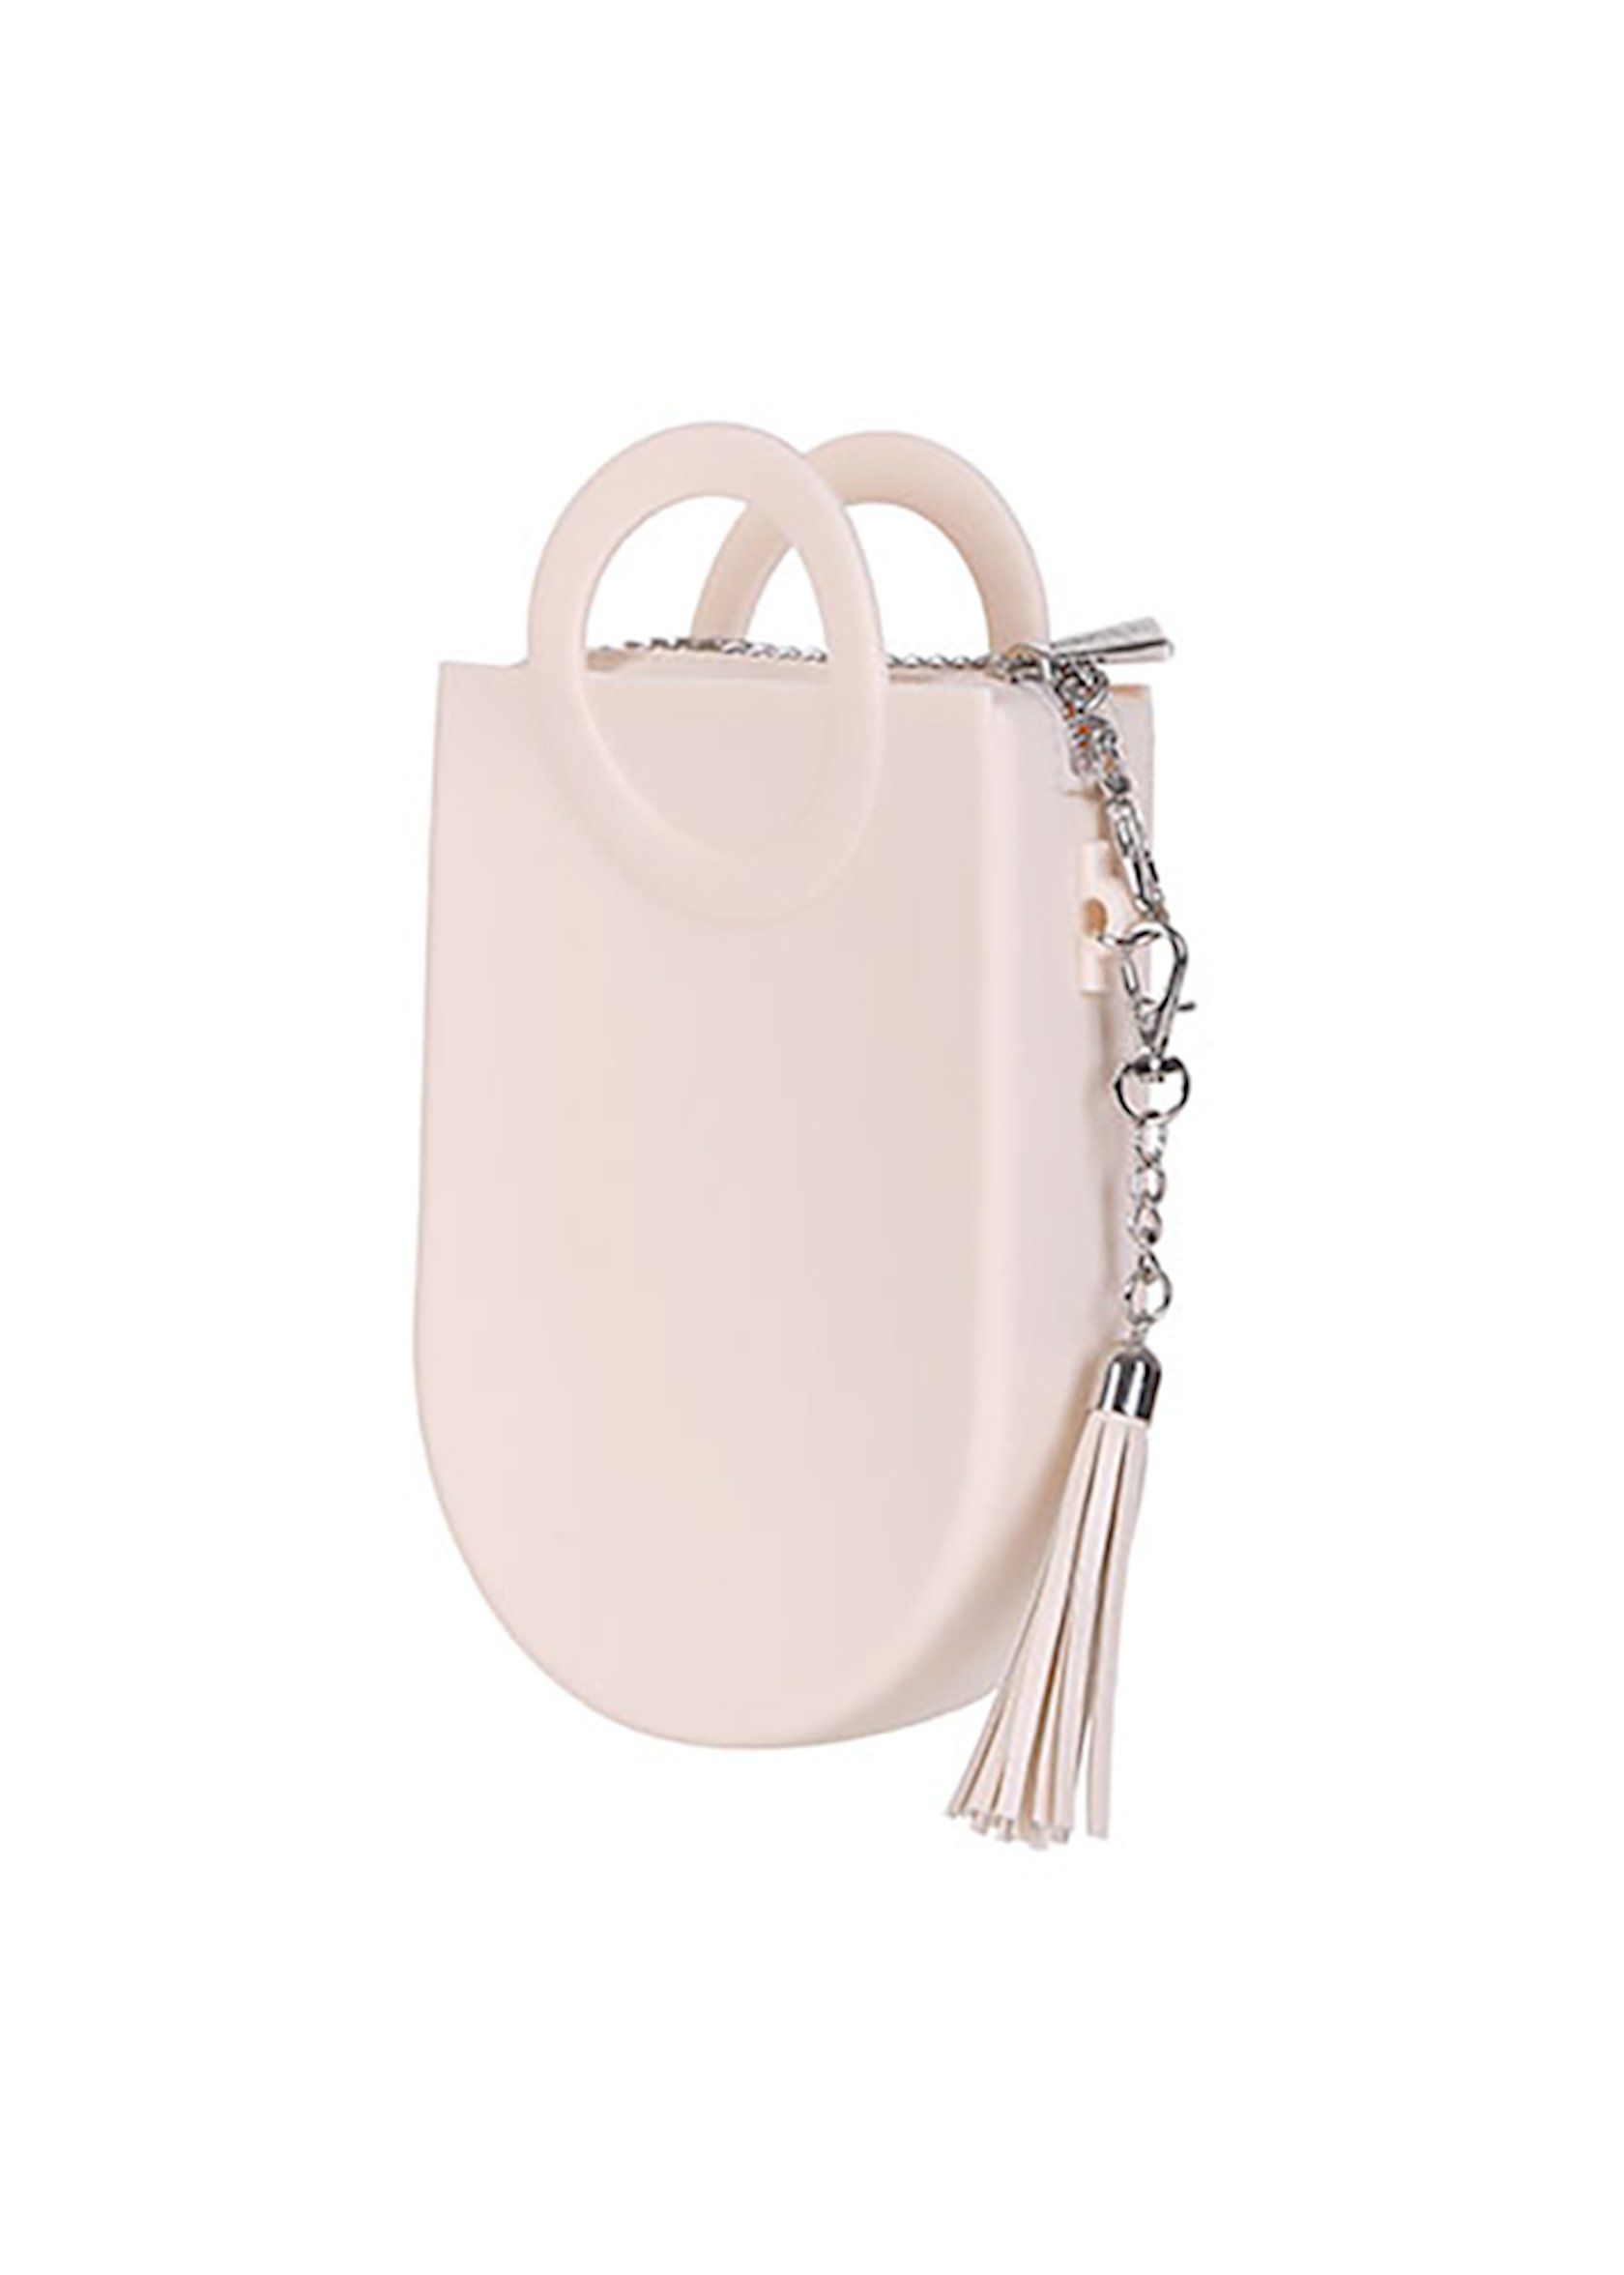 Qadın çantası Miniso Circle Handle Crossbody Bag Cream, krem